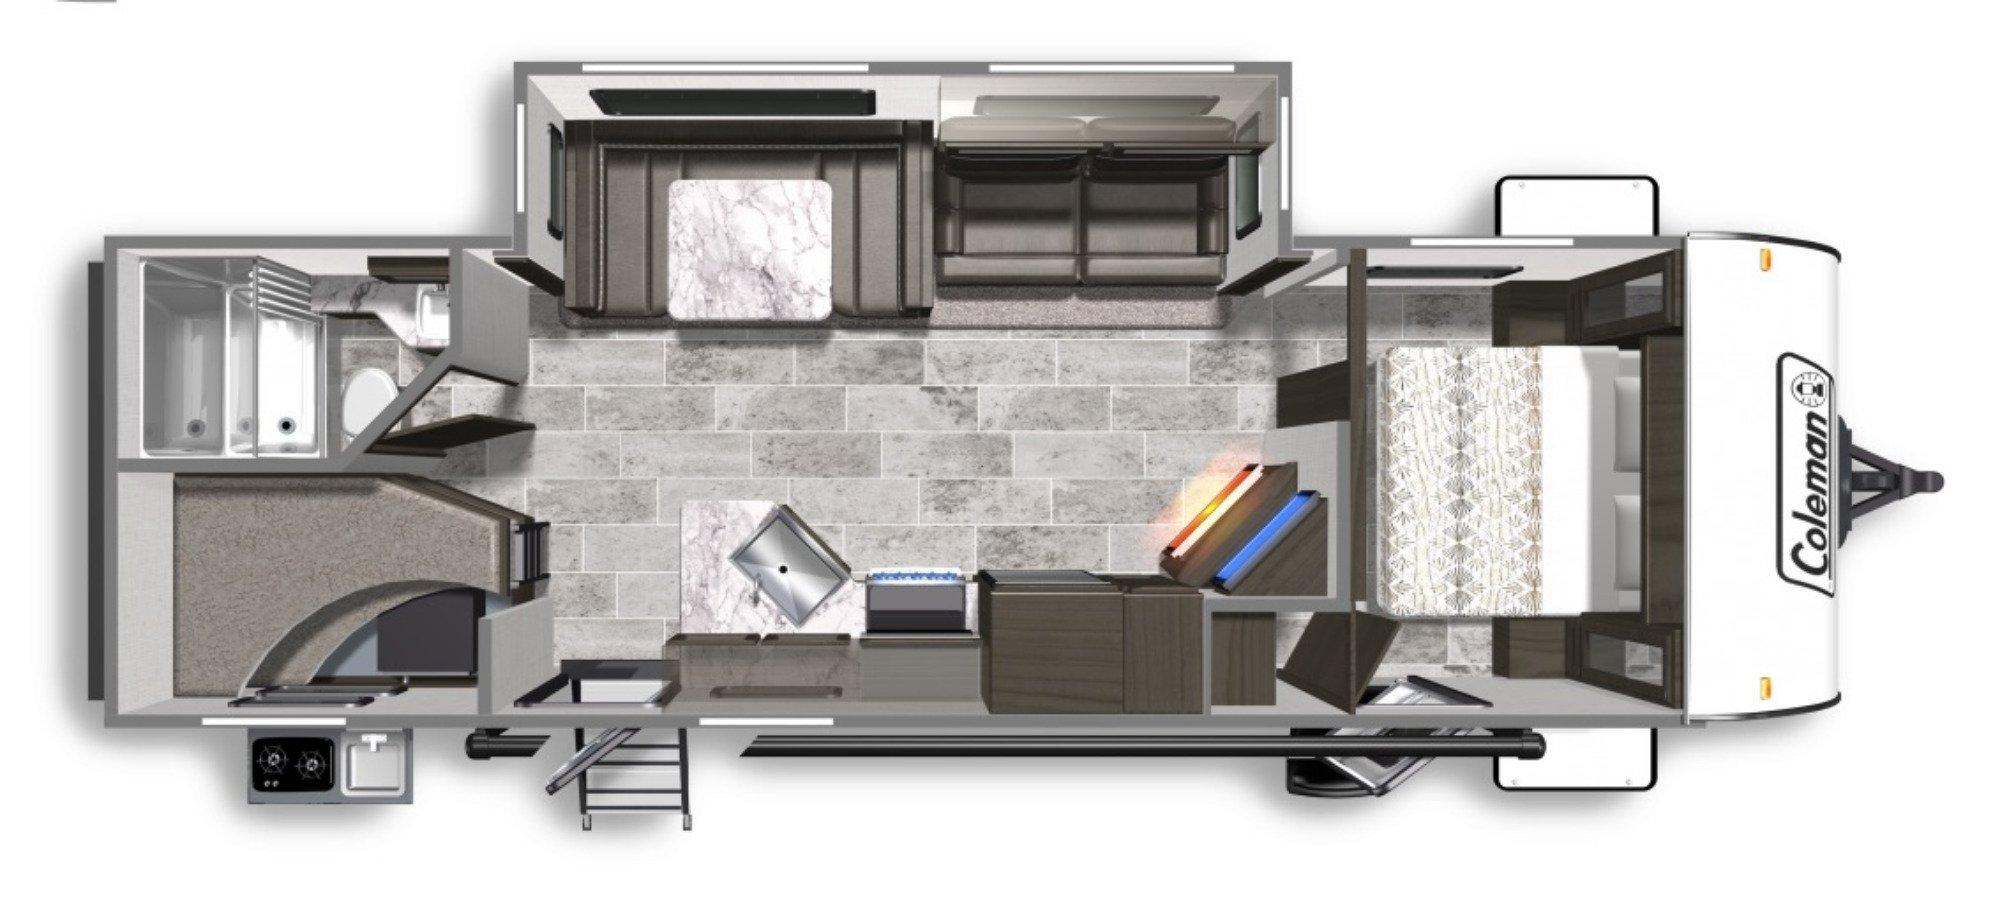 View Floor Plan for 2020 COLEMAN COLEMAN LIGHT 2755BH